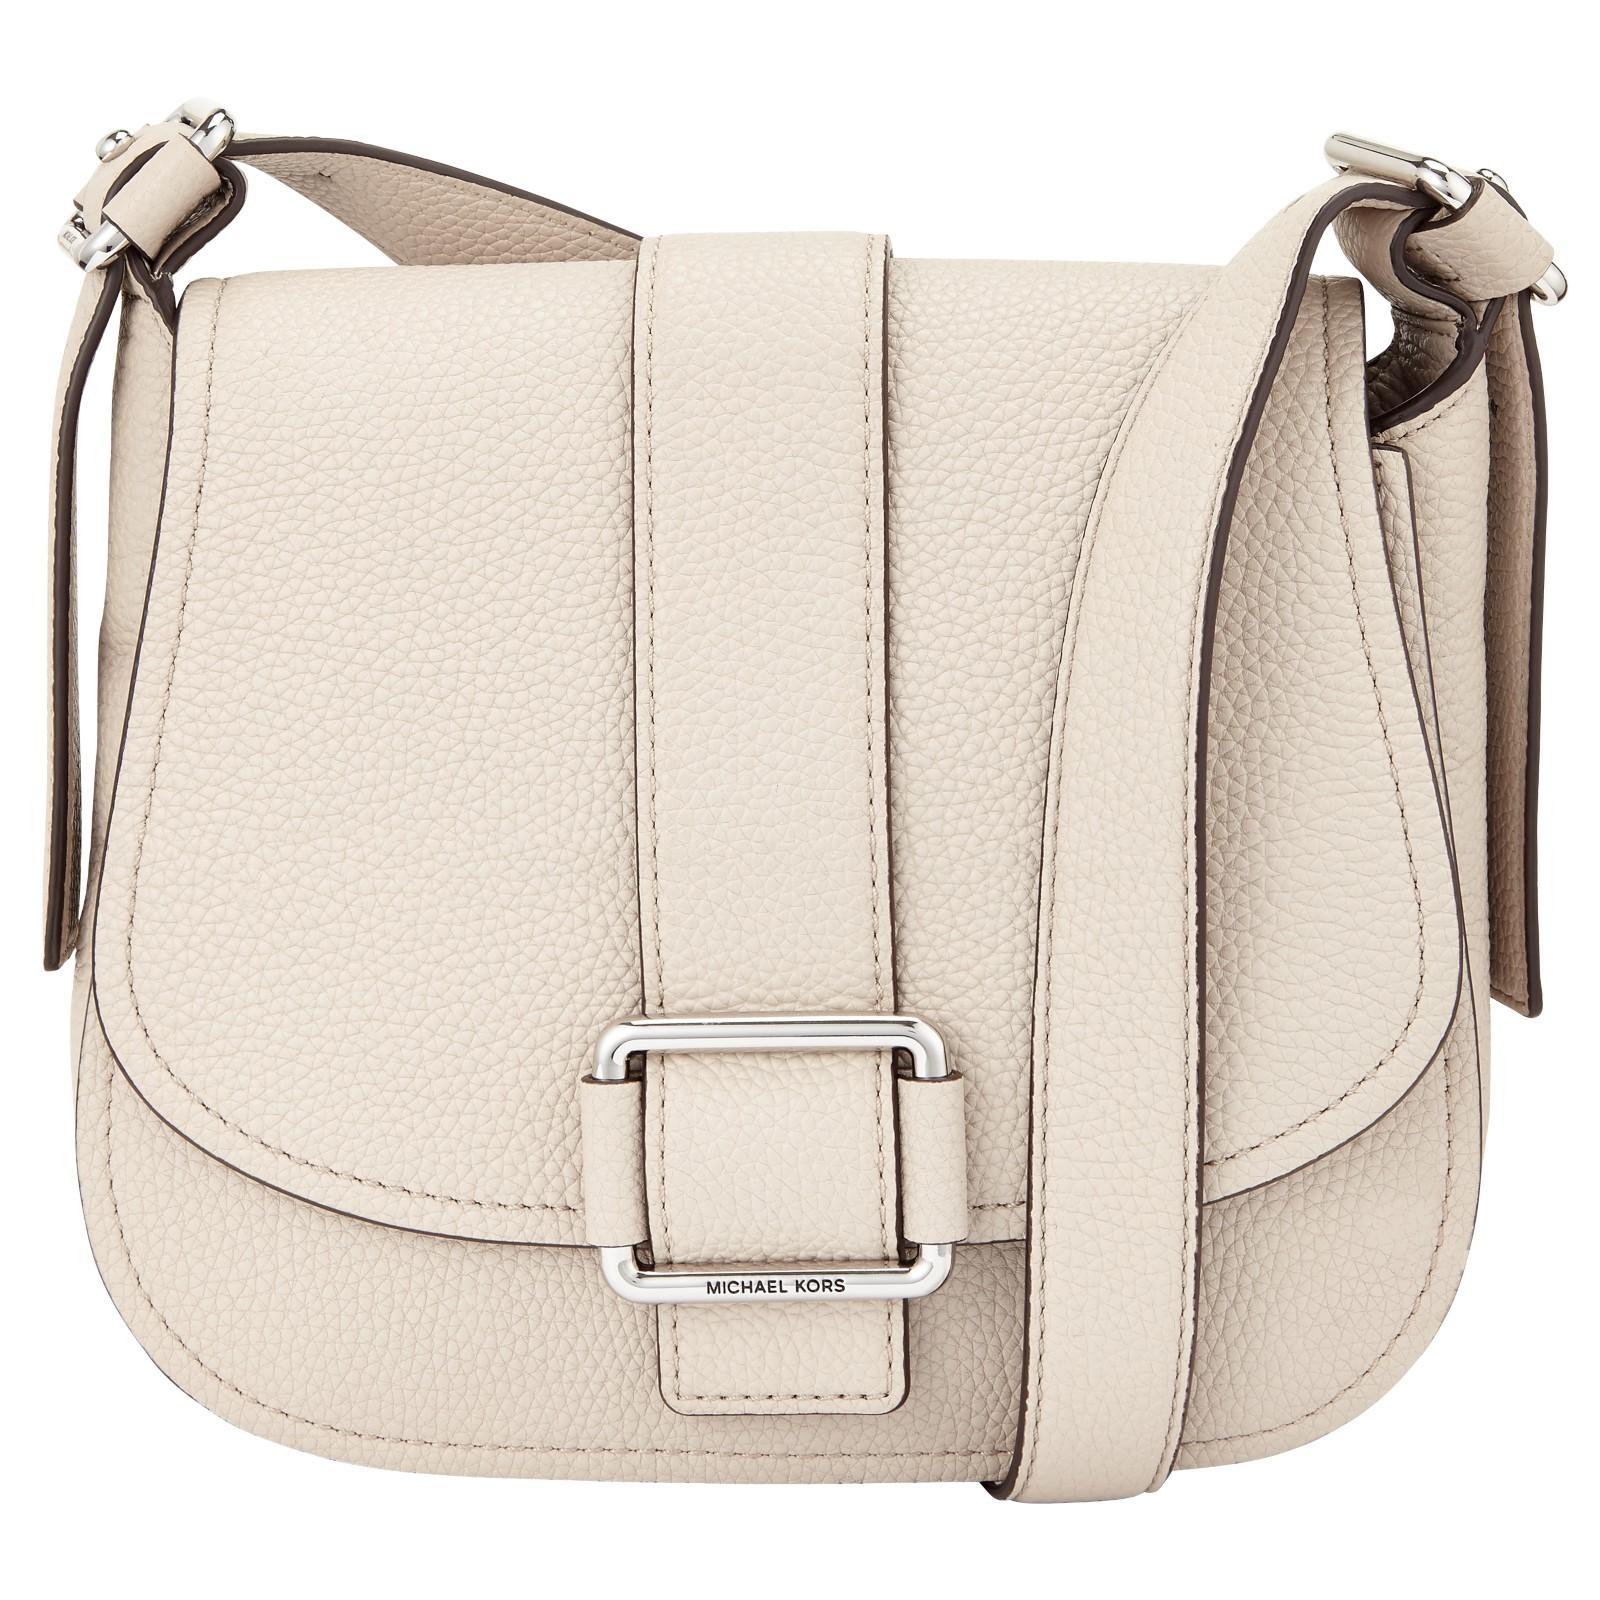 8ba0389e0752 Michael Michael Kors Maxine Large Leather Across Body Bag in Natural ...